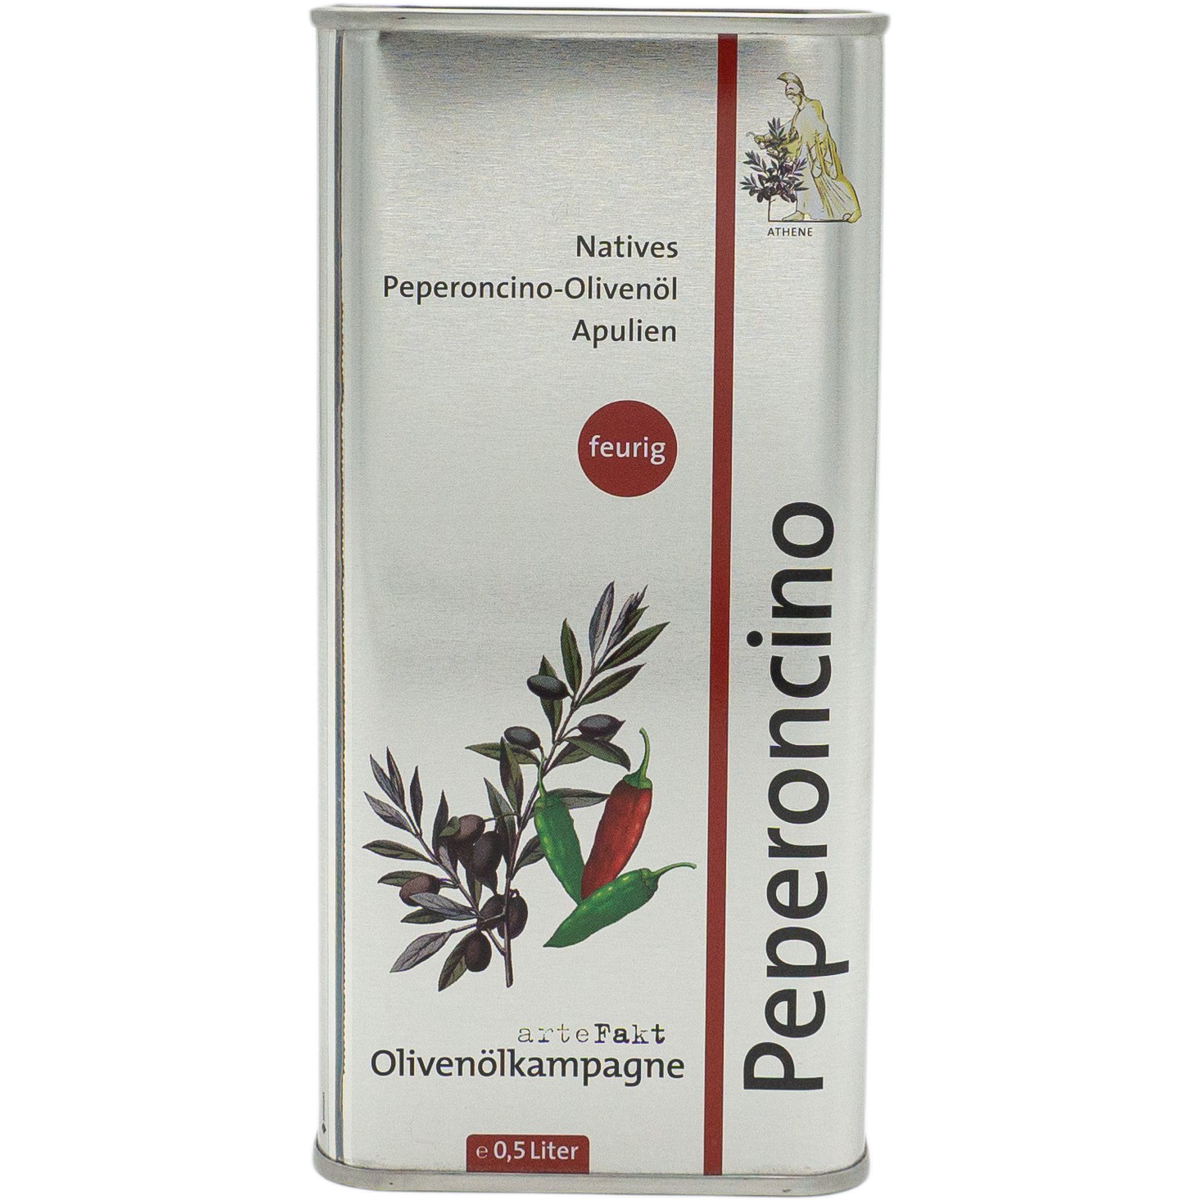 Bio Peperoncino-Olivenöl, nativ